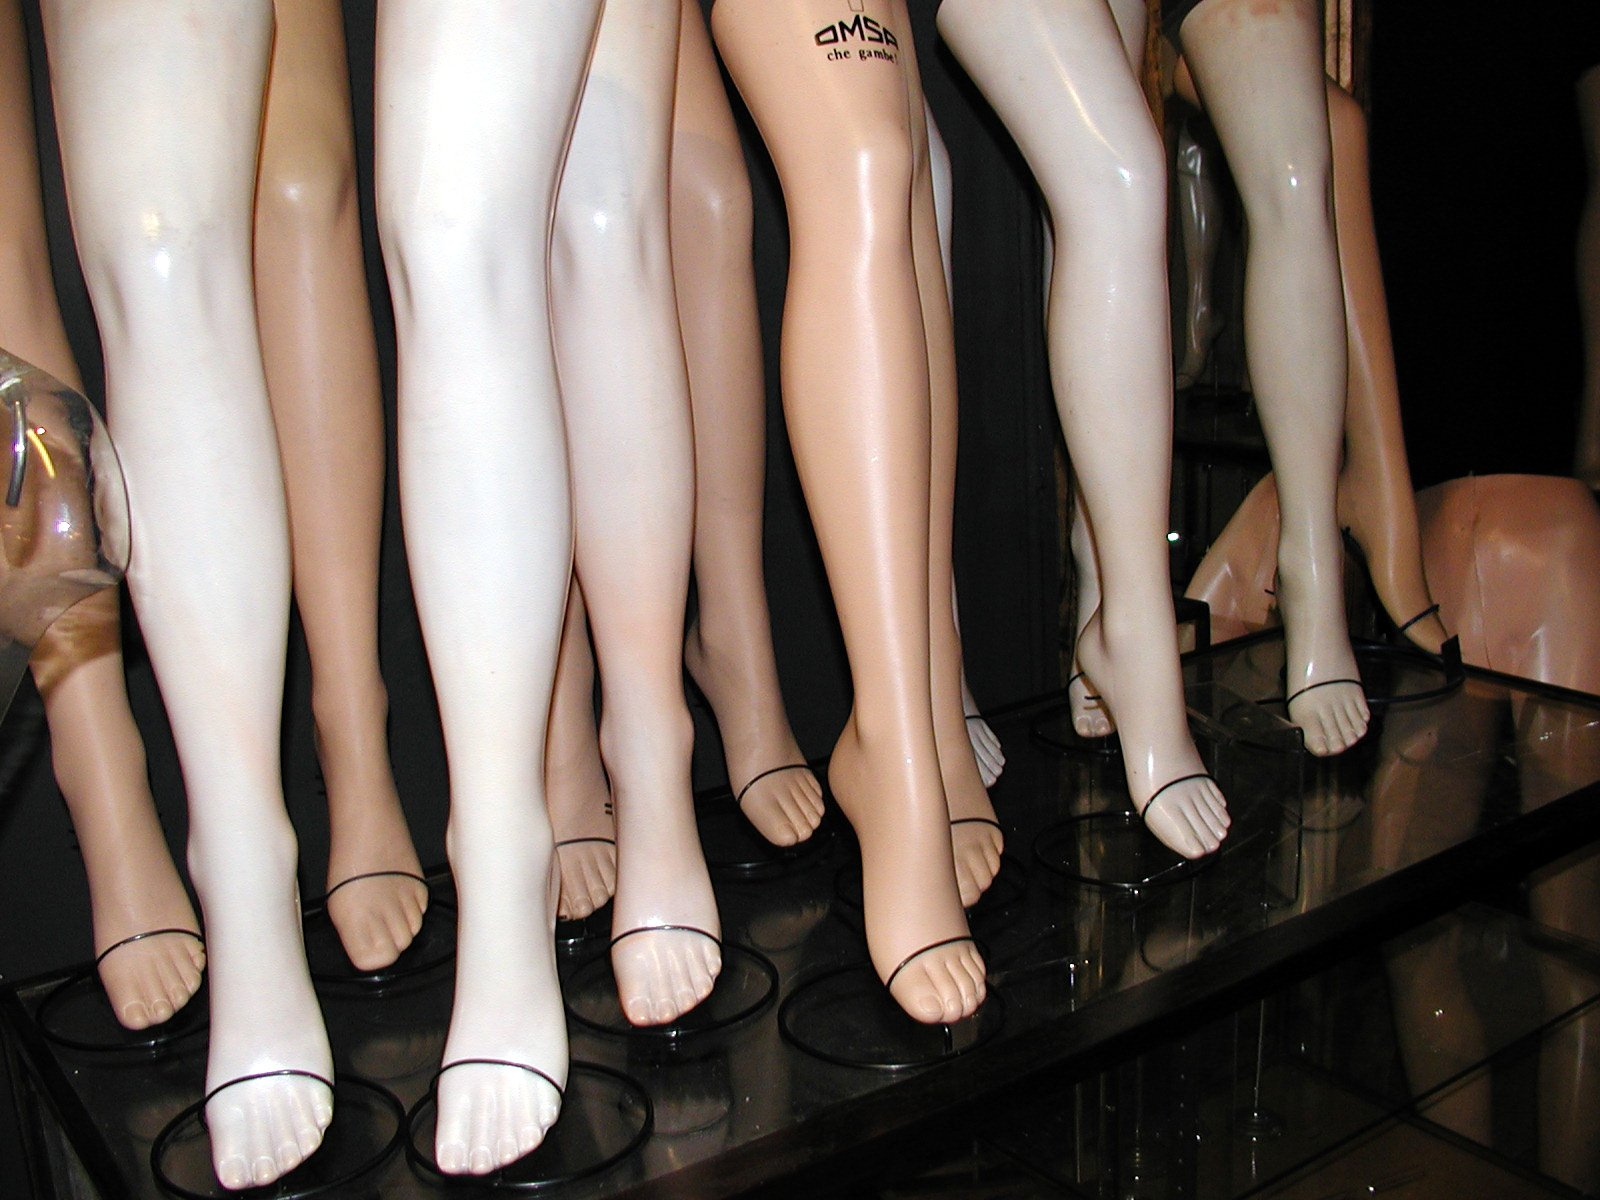 Mannequins leg